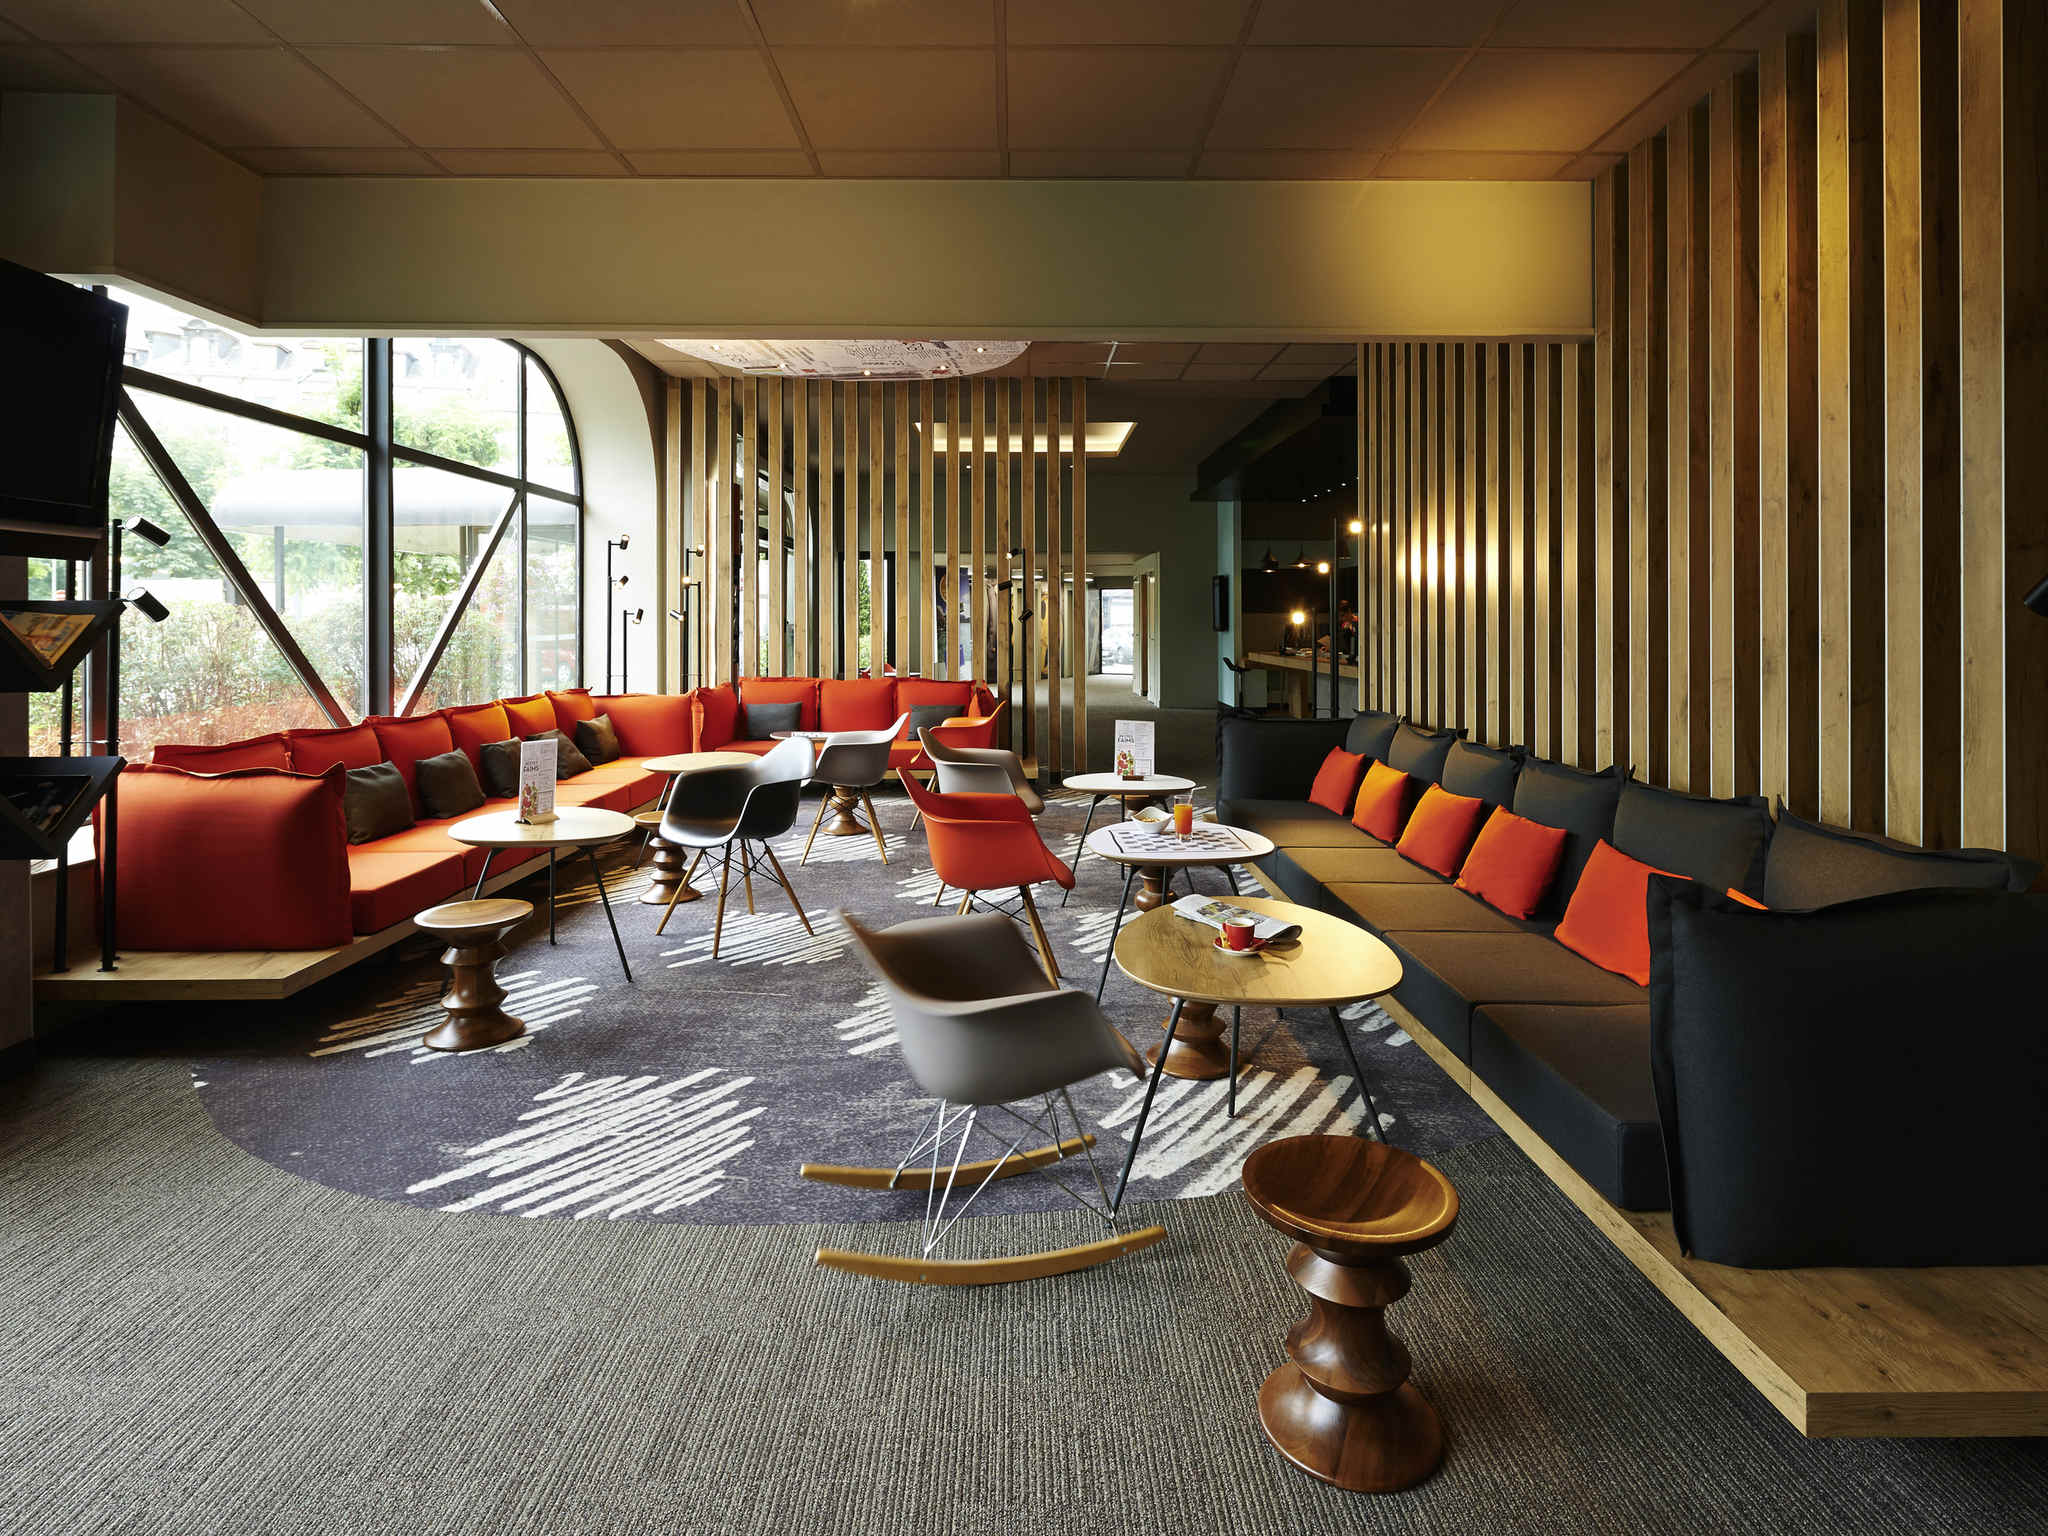 Hotell – Ibis Strasbourg Centre Historique